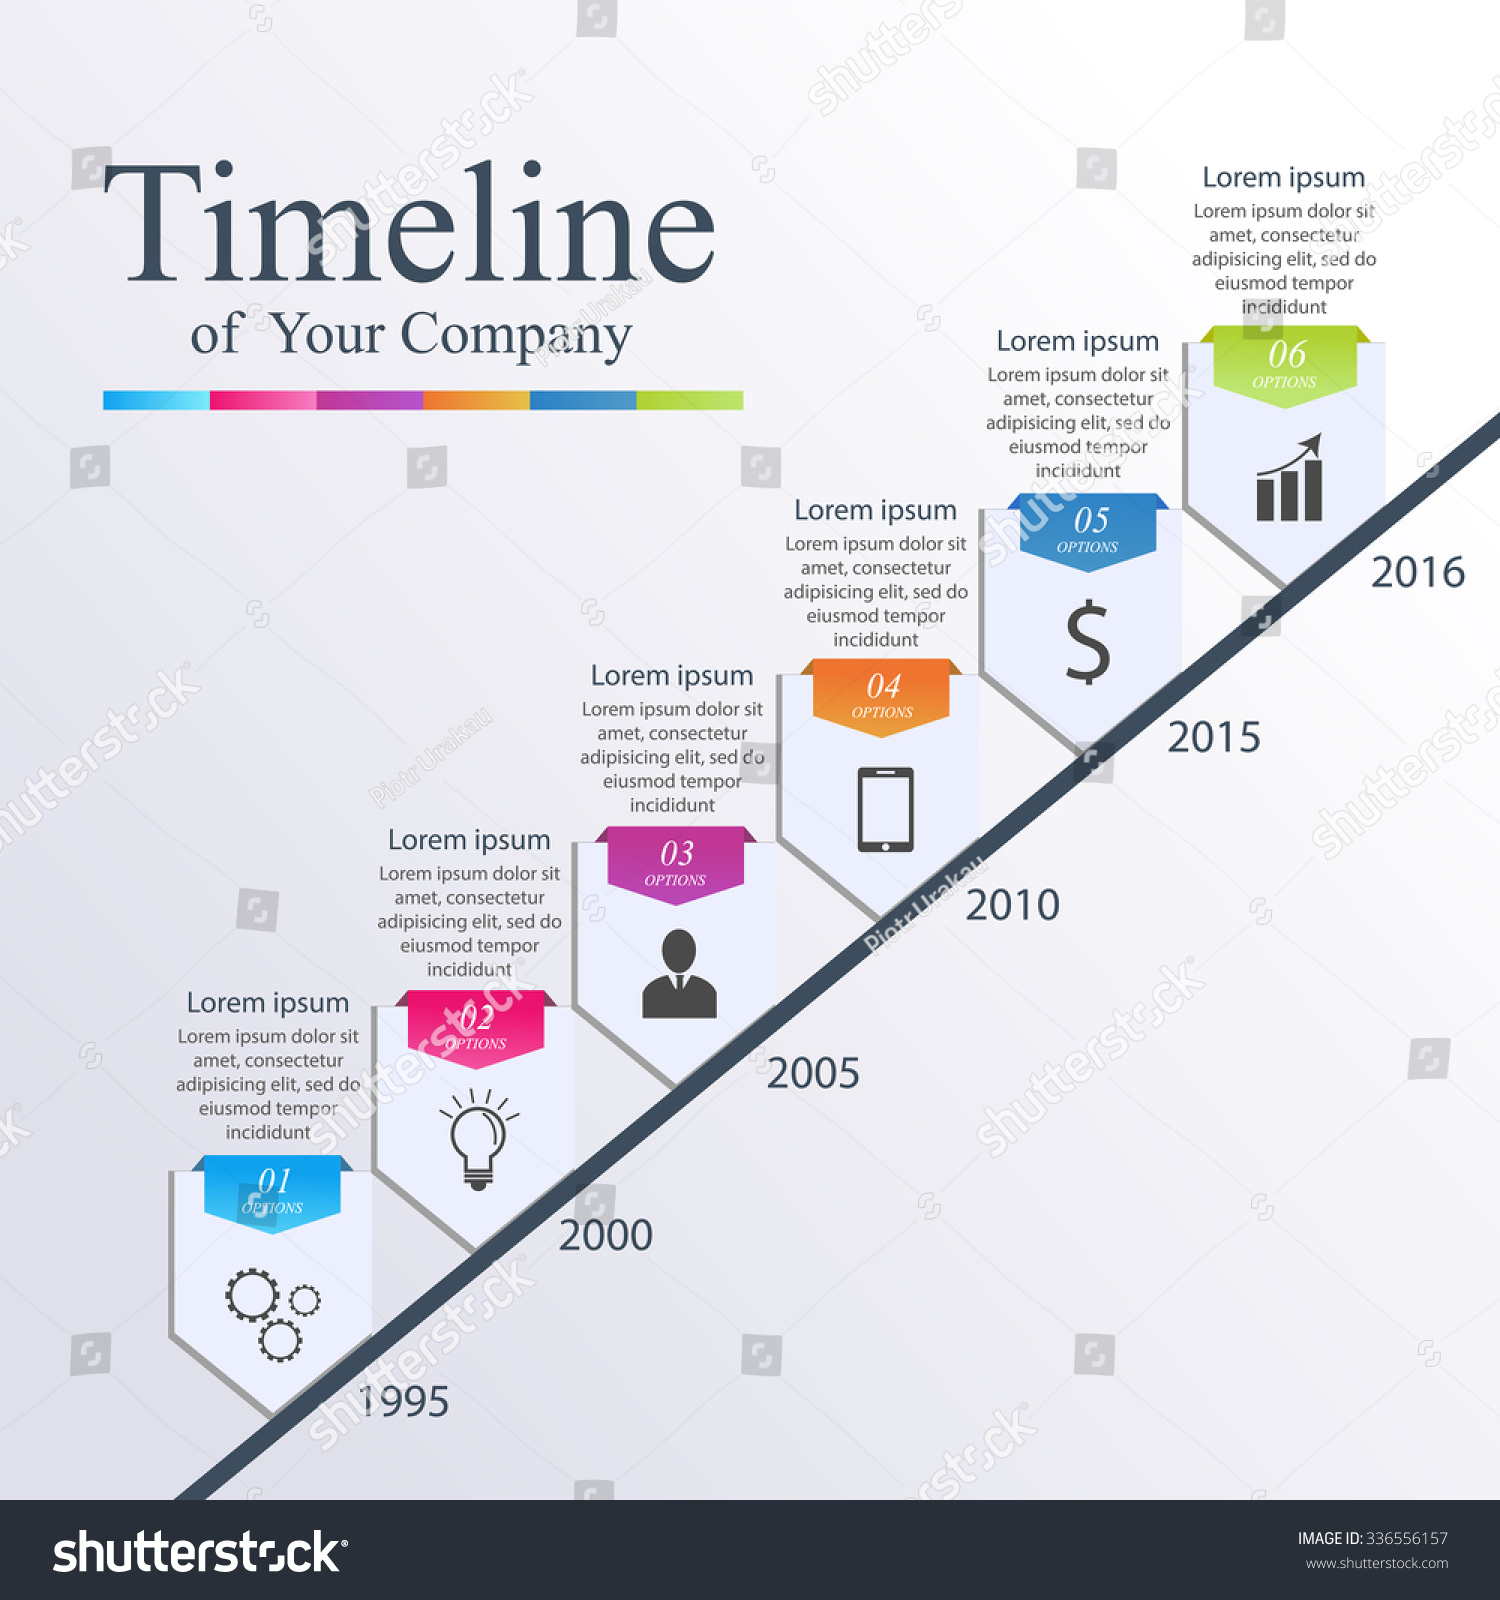 Timeline Infographic Vector Design Illustration Template Stock ...